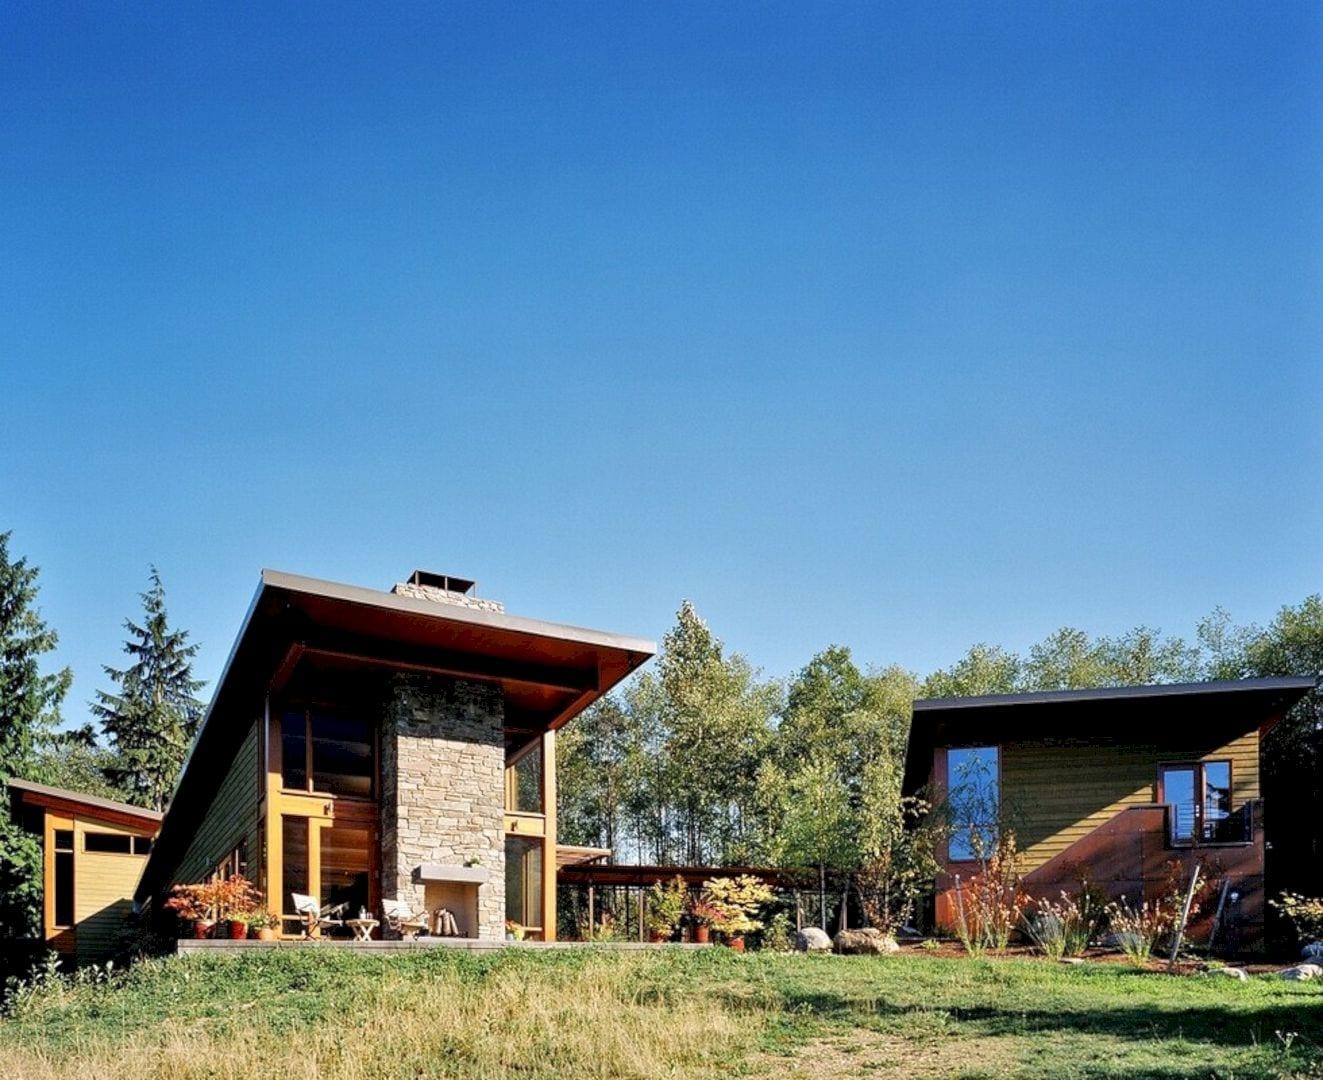 Modern Mountain Cabin North Bend By Prentiss Balance Wickline Architects 6